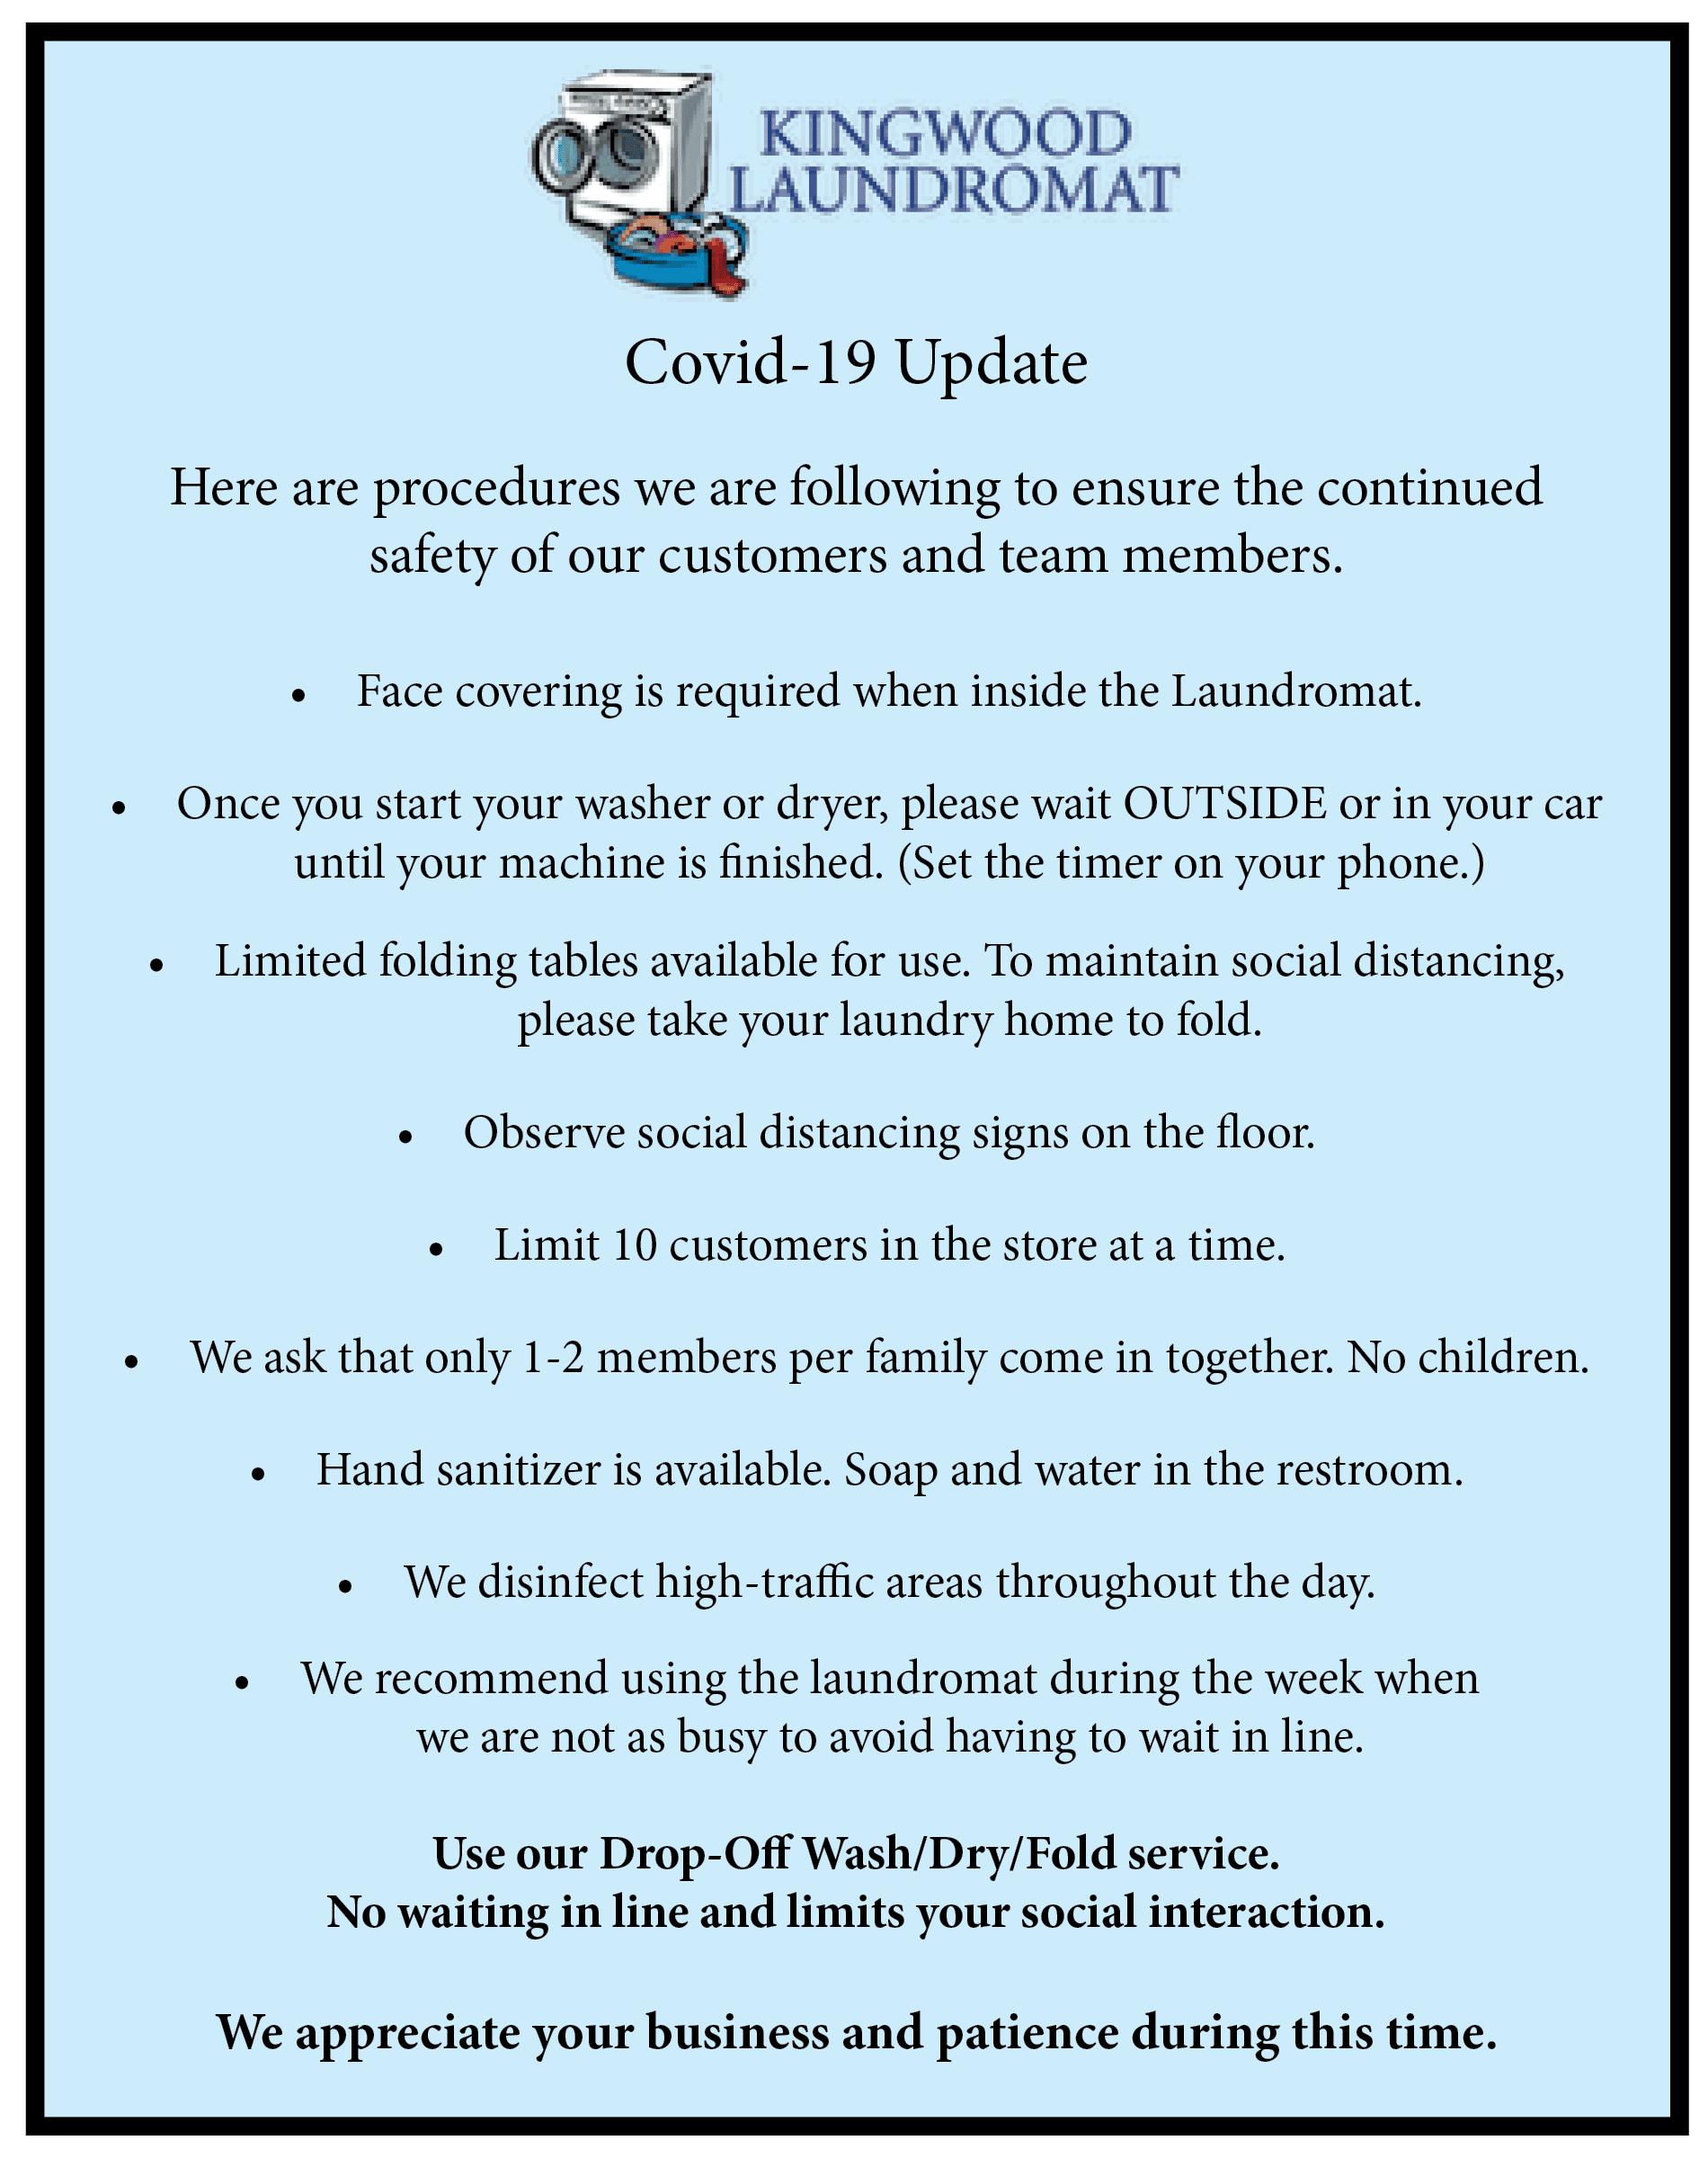 COVID-19 Guidelines Kingwood Laundromat